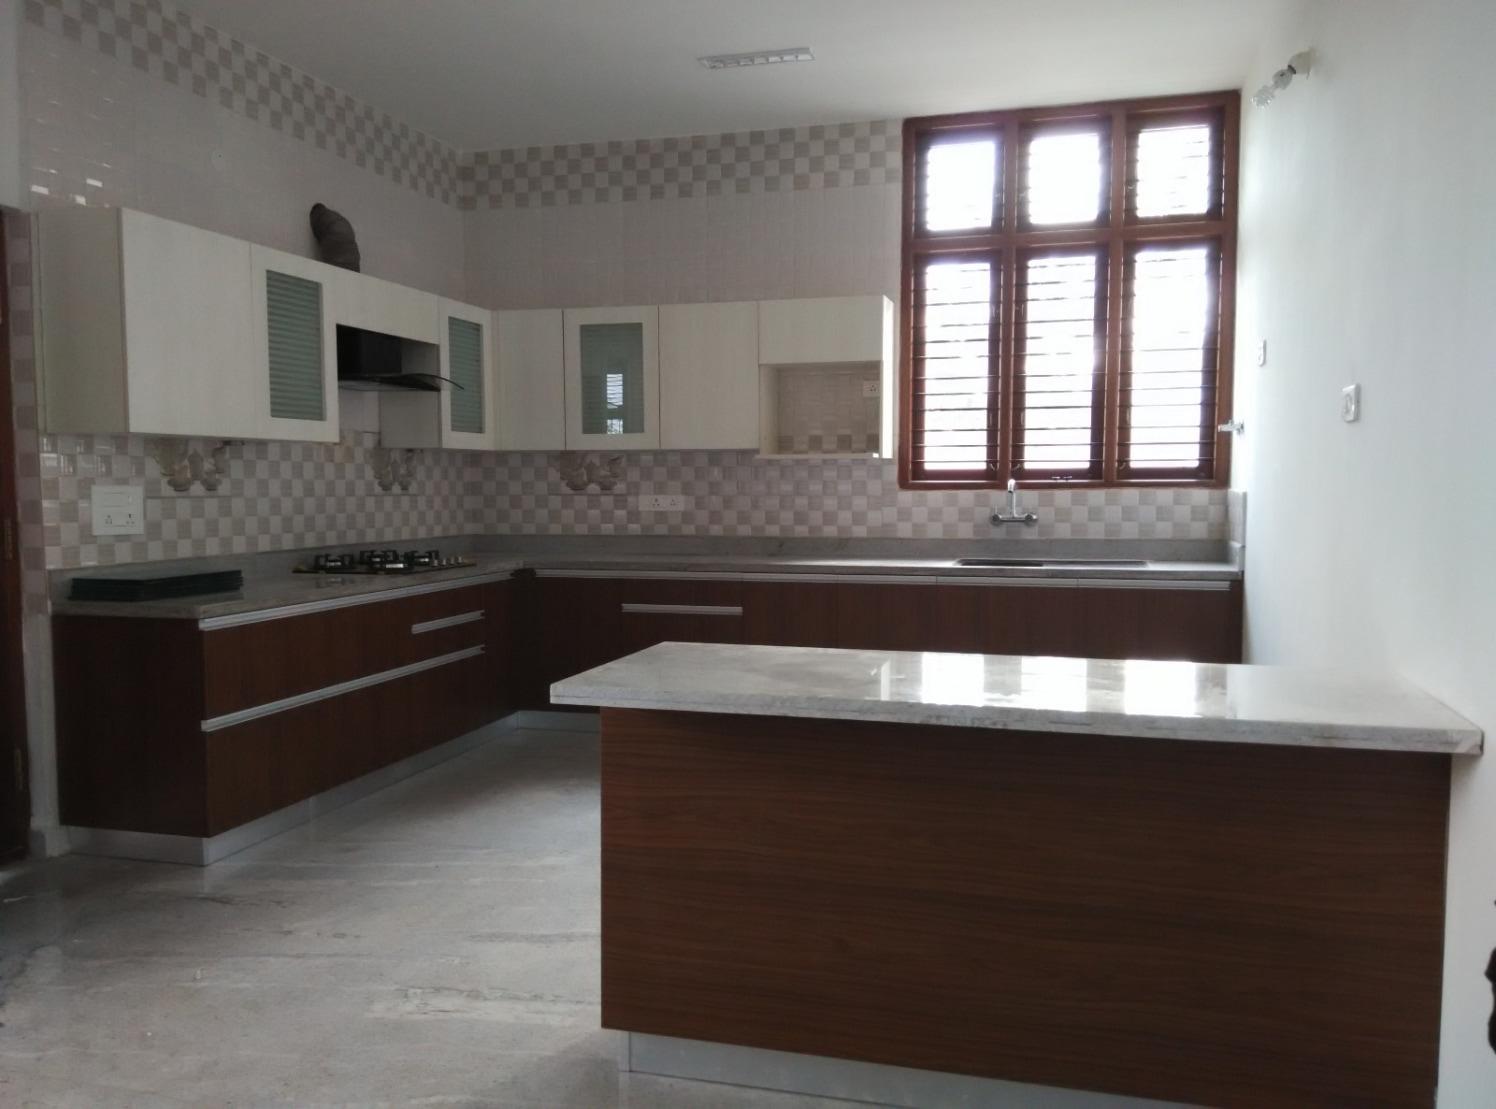 Modular kitchen with pale shades by Syed Illias Modular-kitchen Modern | Interior Design Photos & Ideas